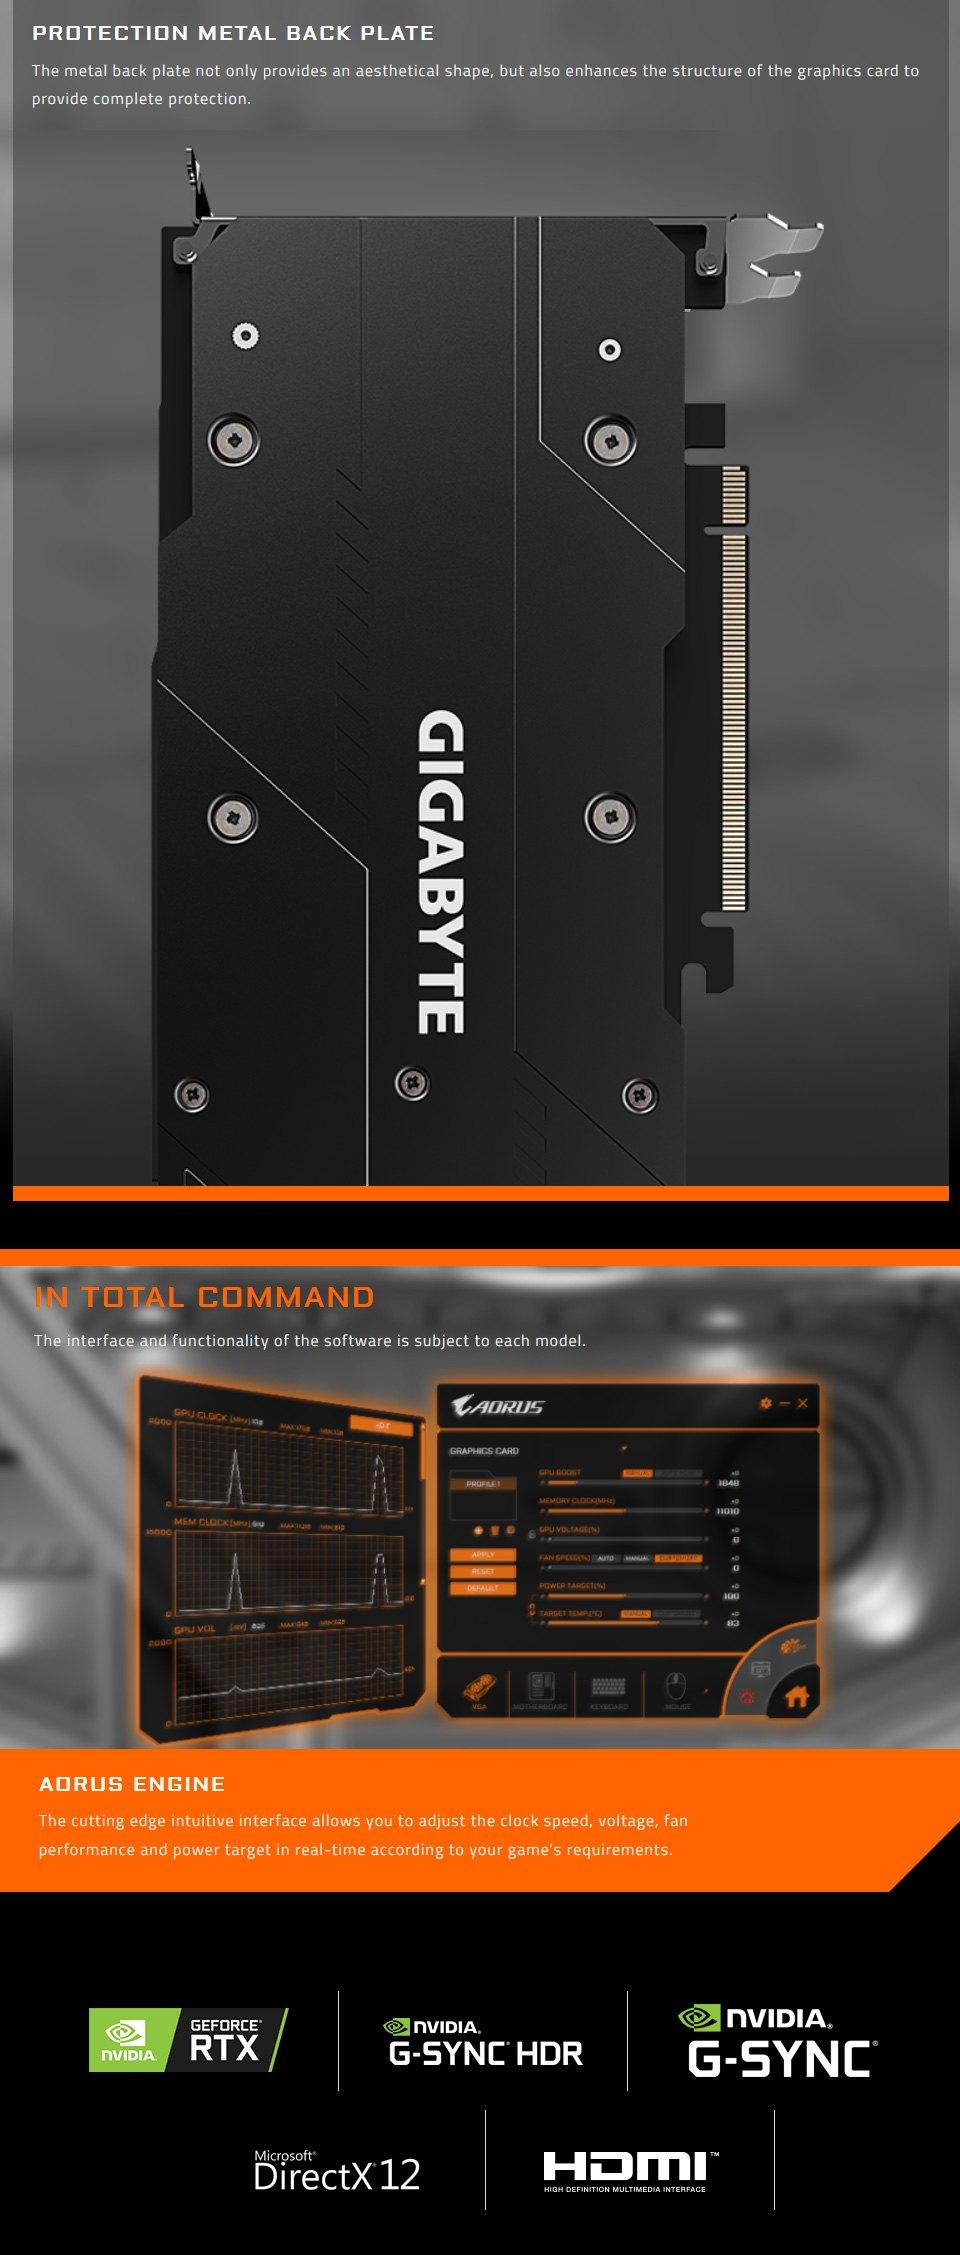 Gigabyte GeForce RTX 2060 Super Gaming OC 3X 8GB features 4